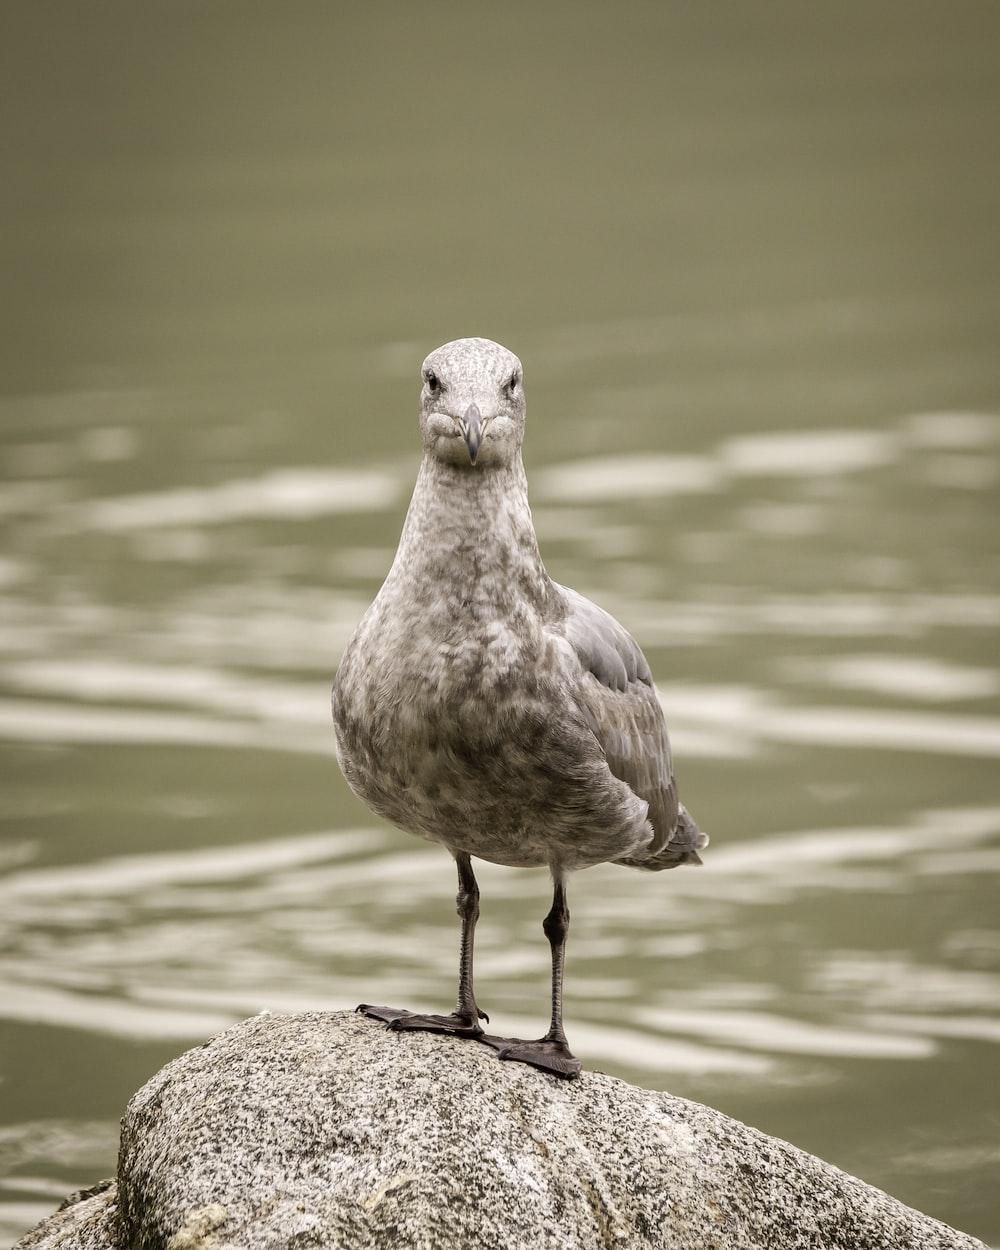 brown bird on brown rock near body of water during daytime